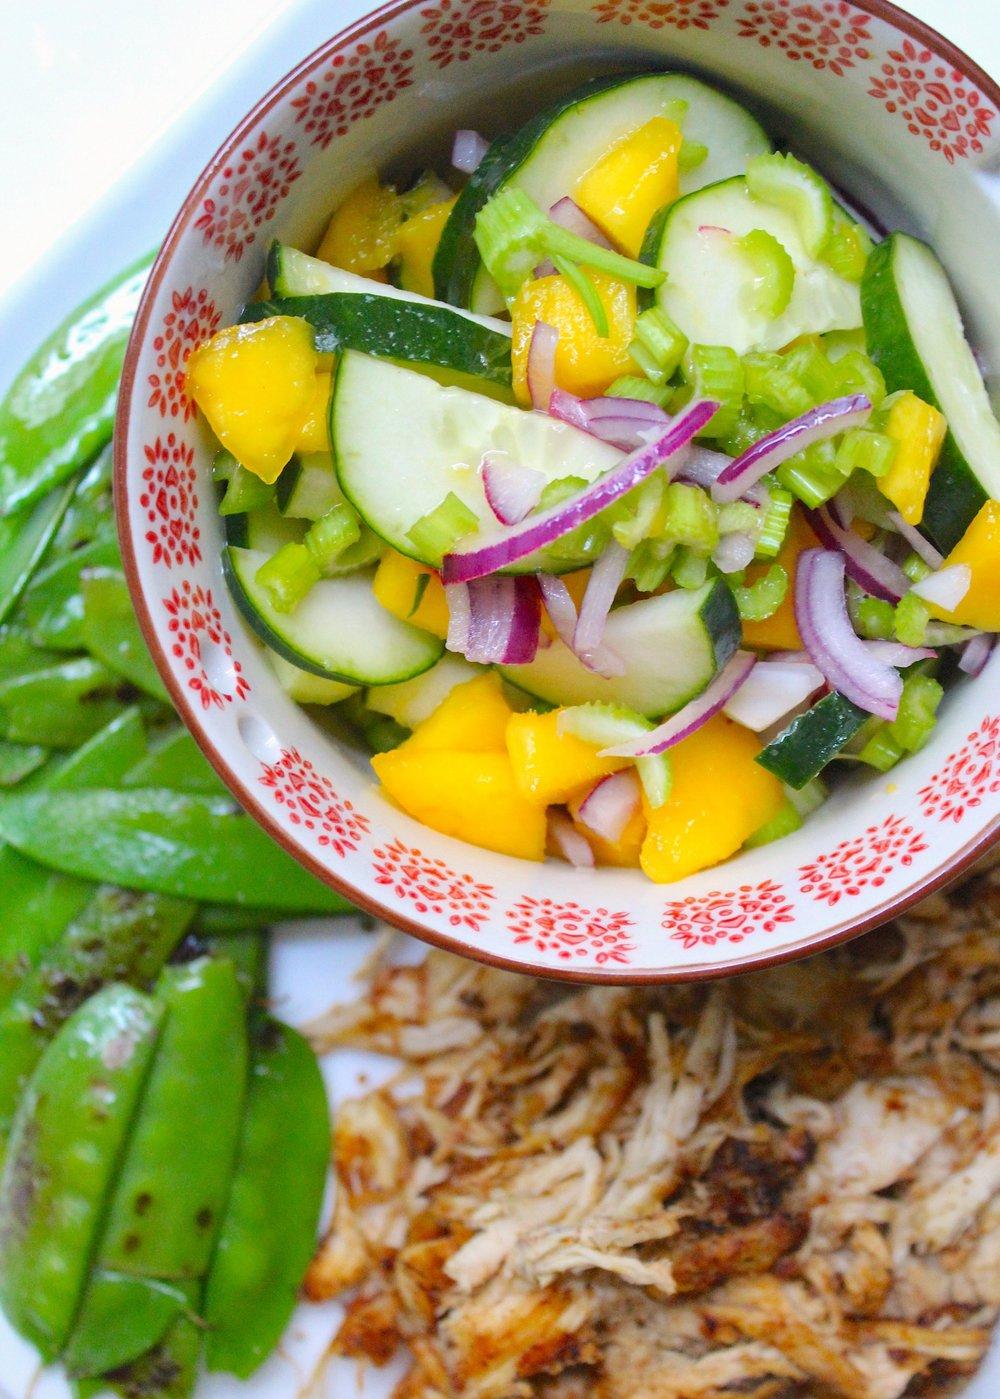 Ensalada de mango, pepino, cebolla, apio, limón con pollito del caldo doradito en ghee y vainitas chinas salteadas con ajo.